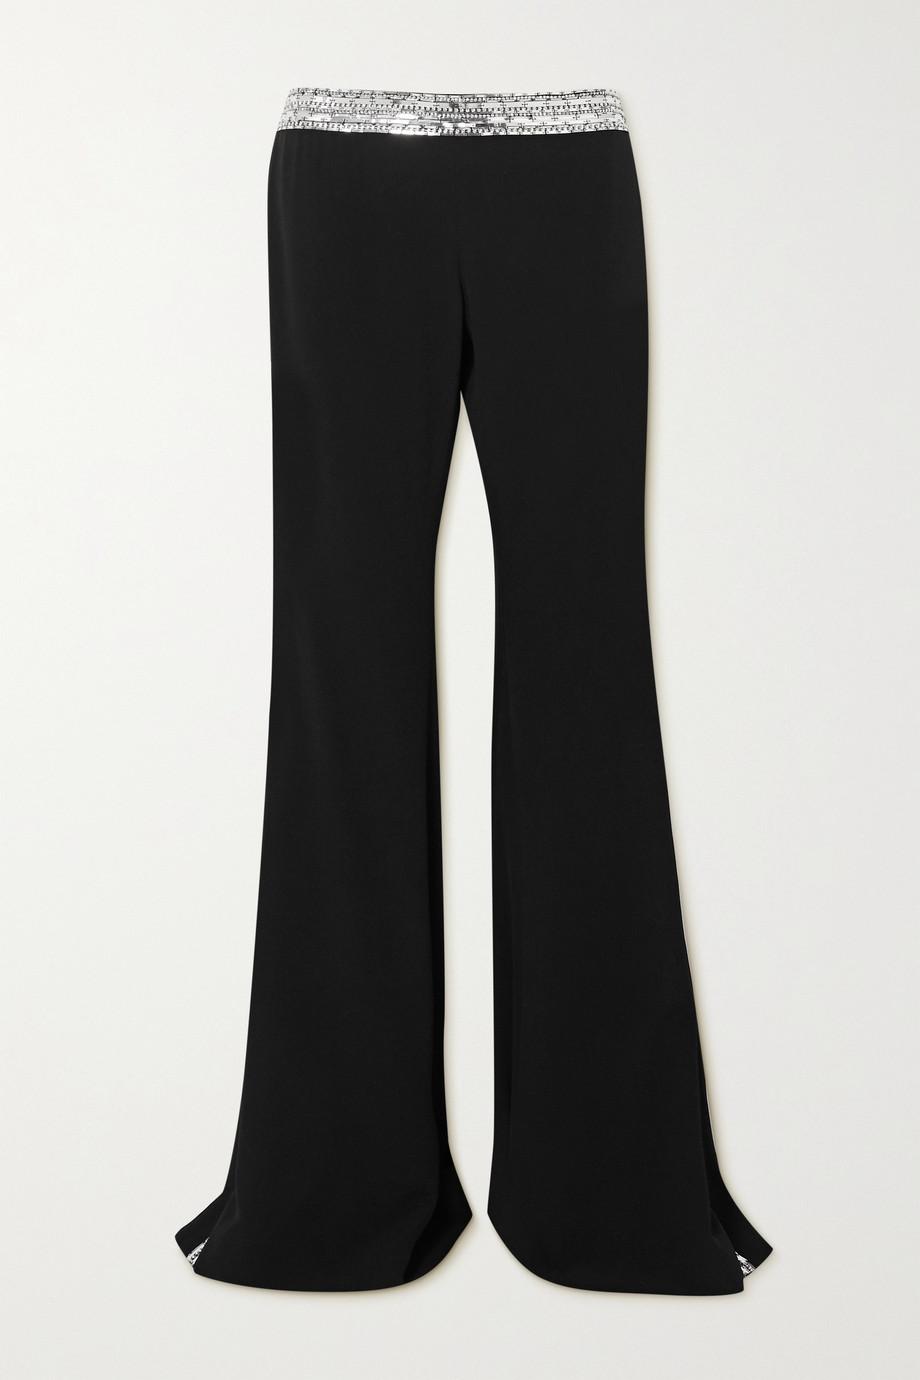 Balmain Embellished crepe flared pants